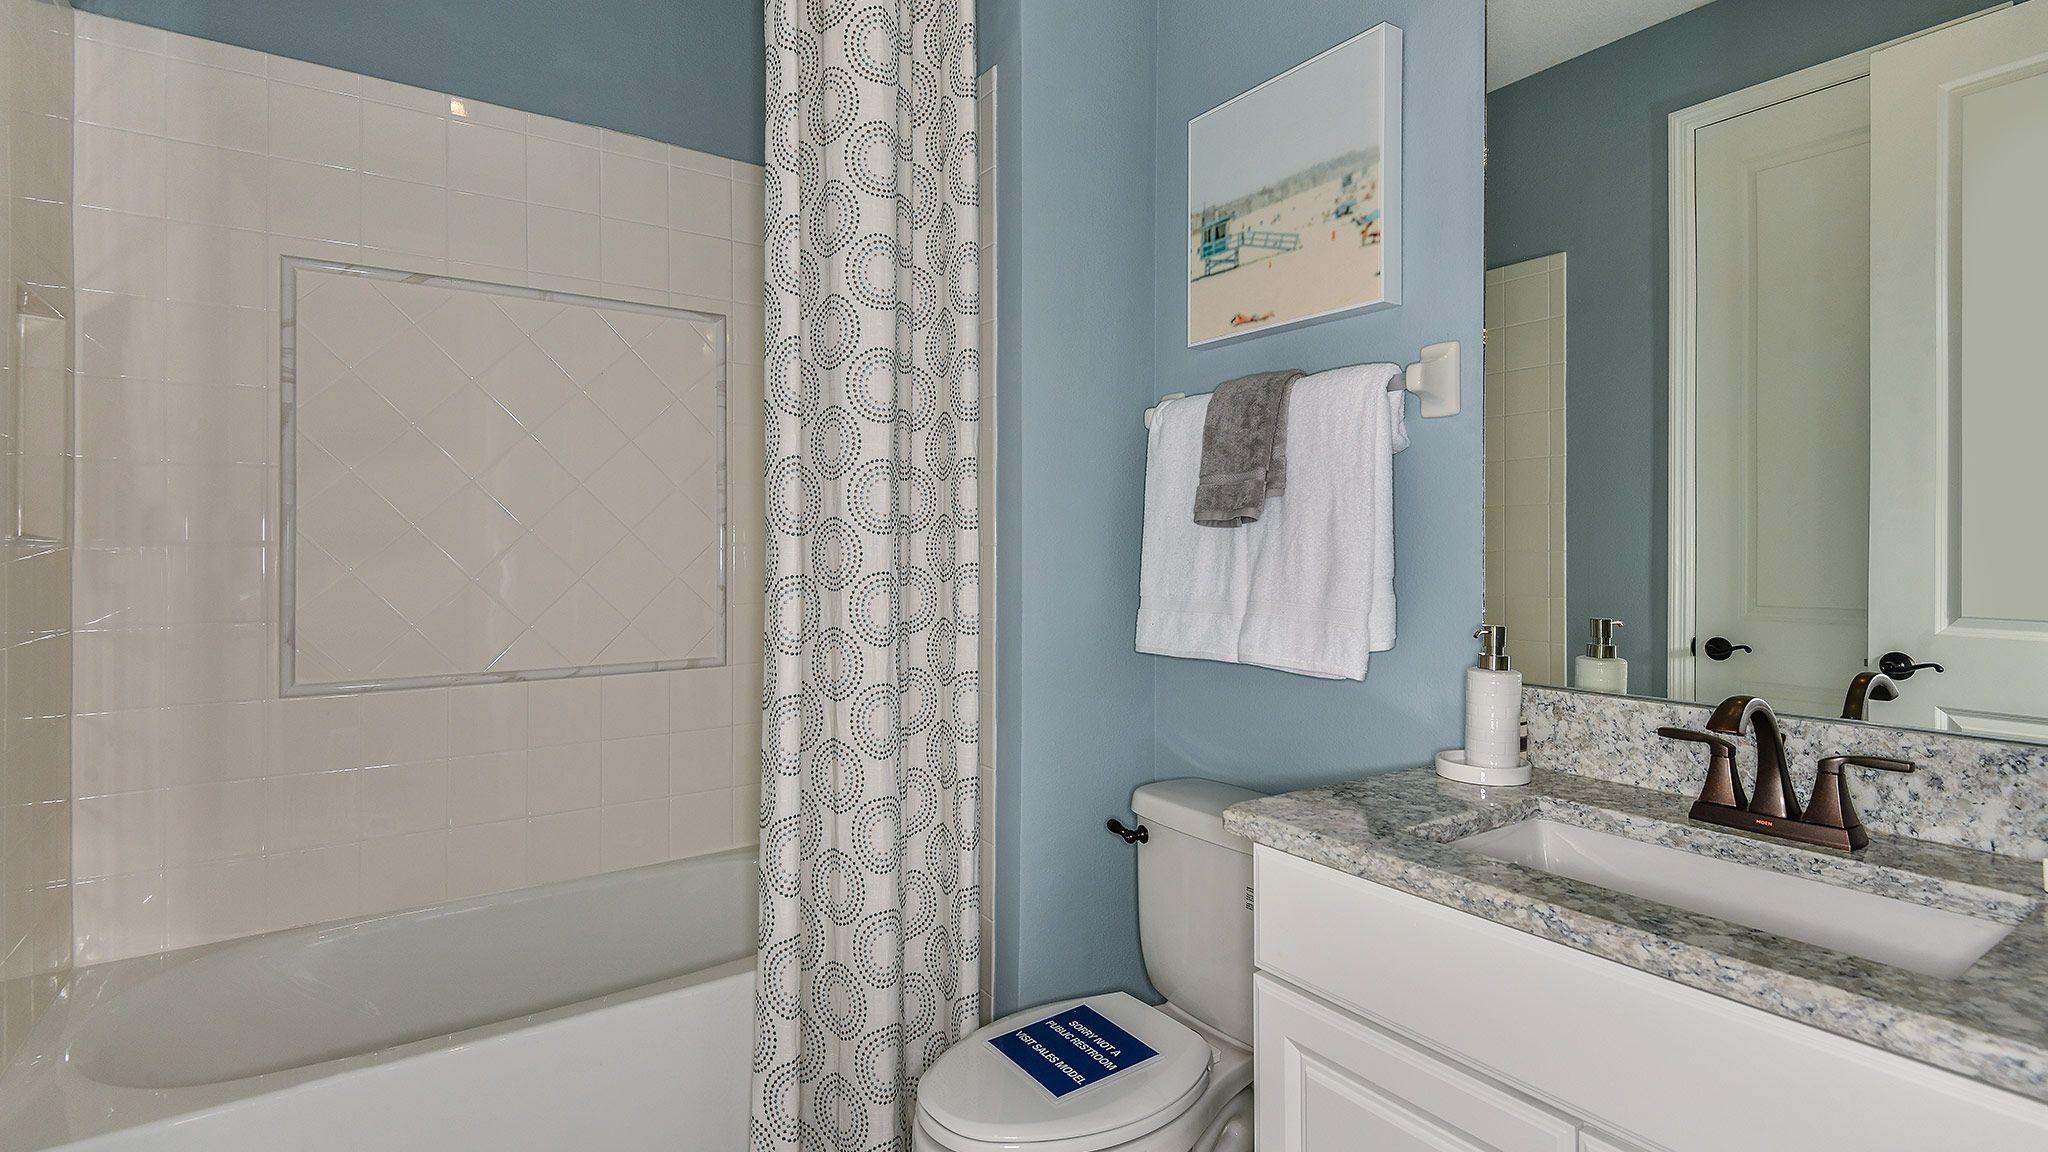 Bathroom featured in the Antigua By Taylor Morrison in Sarasota-Bradenton, FL